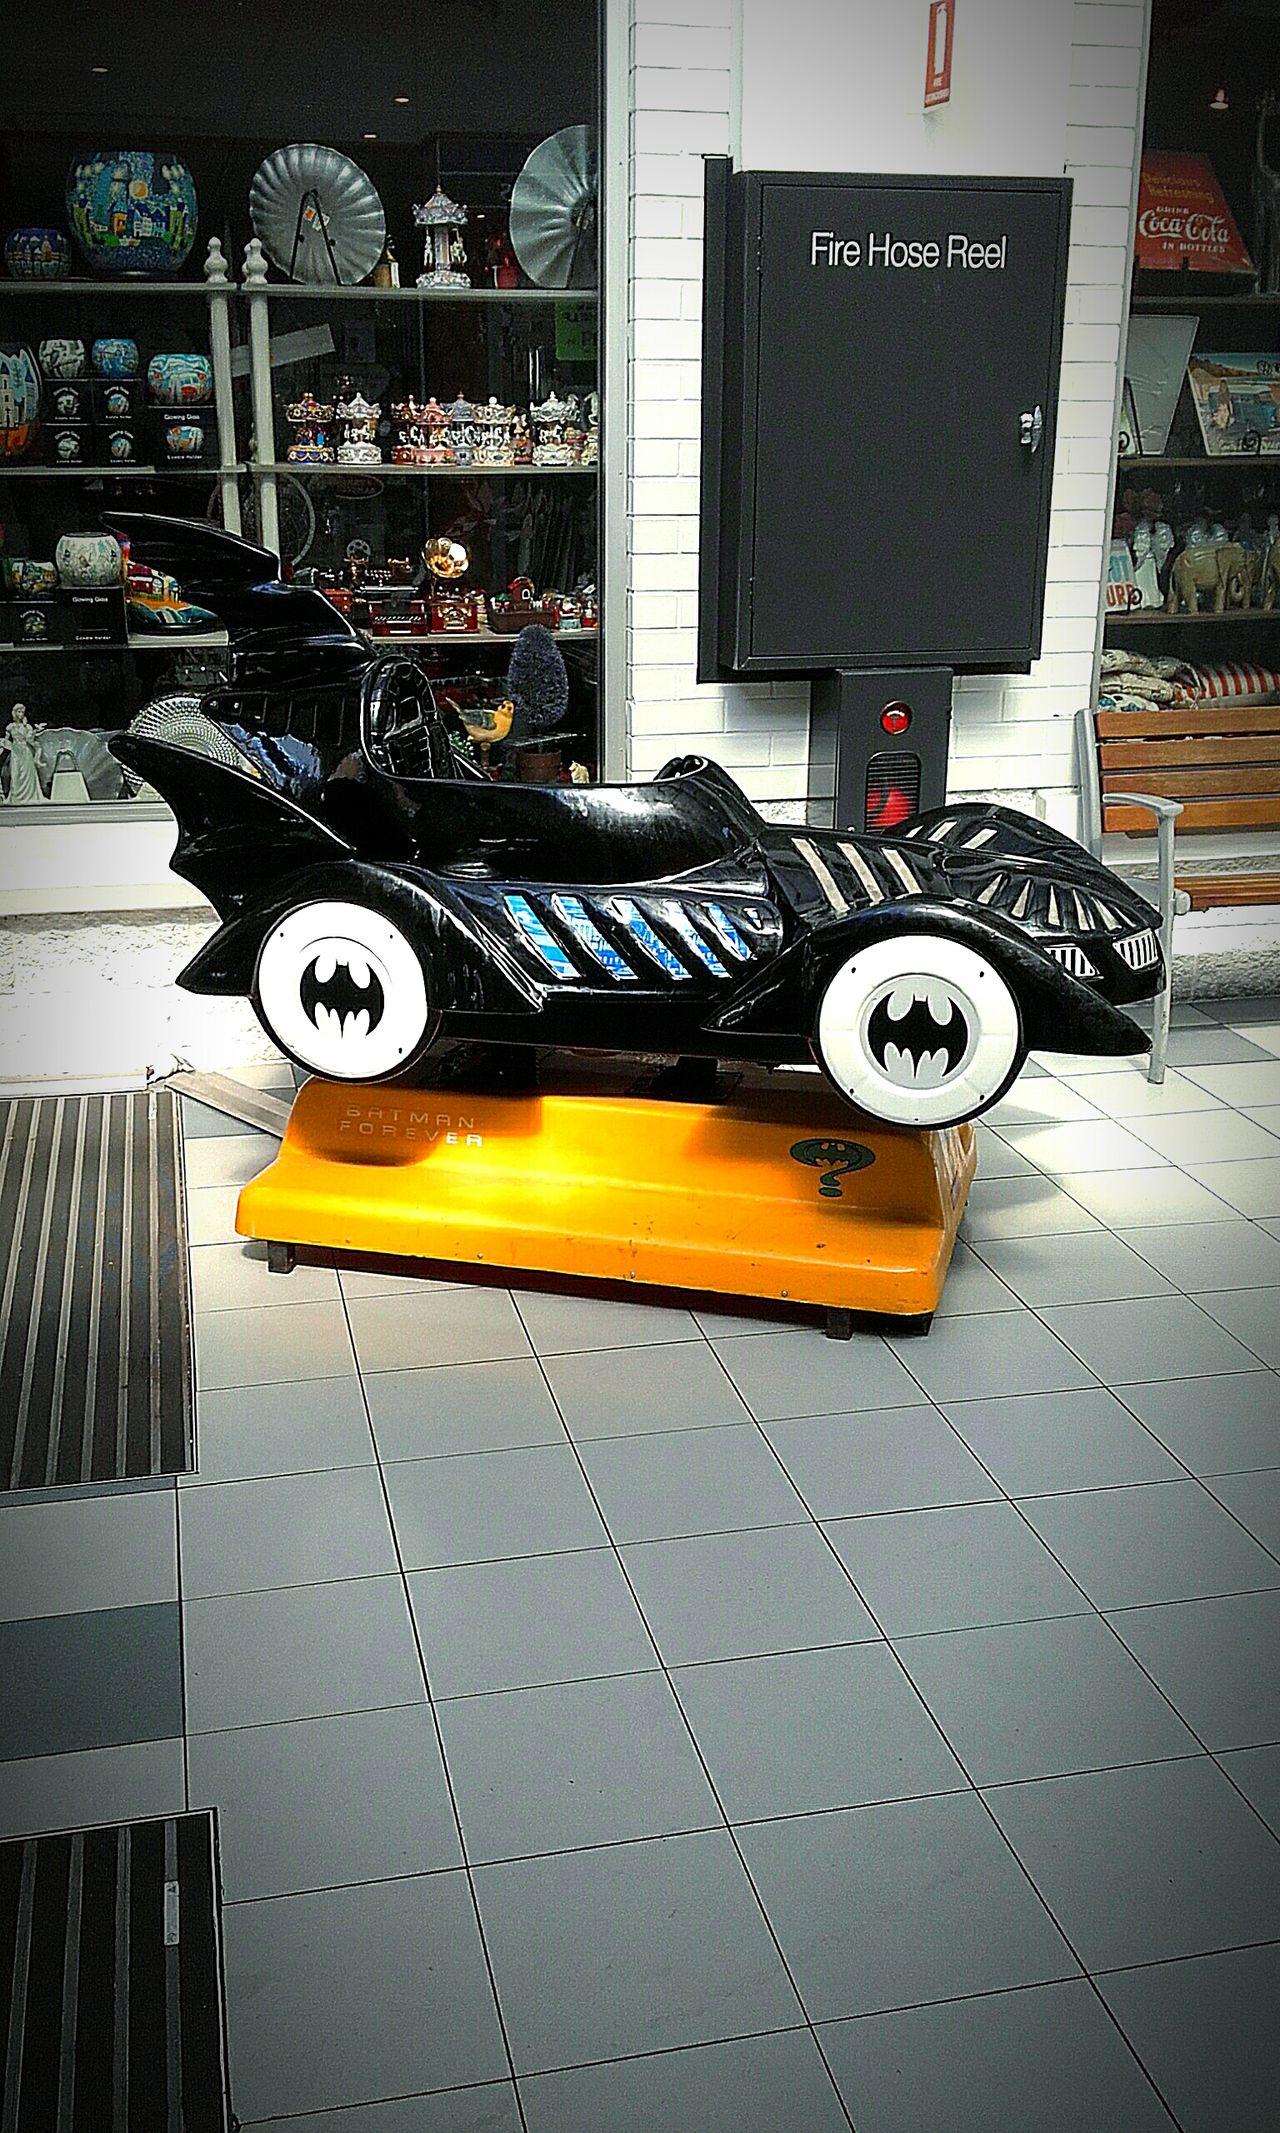 Batman Is In Town Batman Batmobile Batman ❤ Batman Time Rides Shoppingmall Shoppingmalls Shopping Mall Shopping Center Shopping Malls Shopping Mall 😄 Shopping Centre Ride Batmanfan Gotham City Gotham City: Batman To The Batcave To The Batcave! Batman And Robin